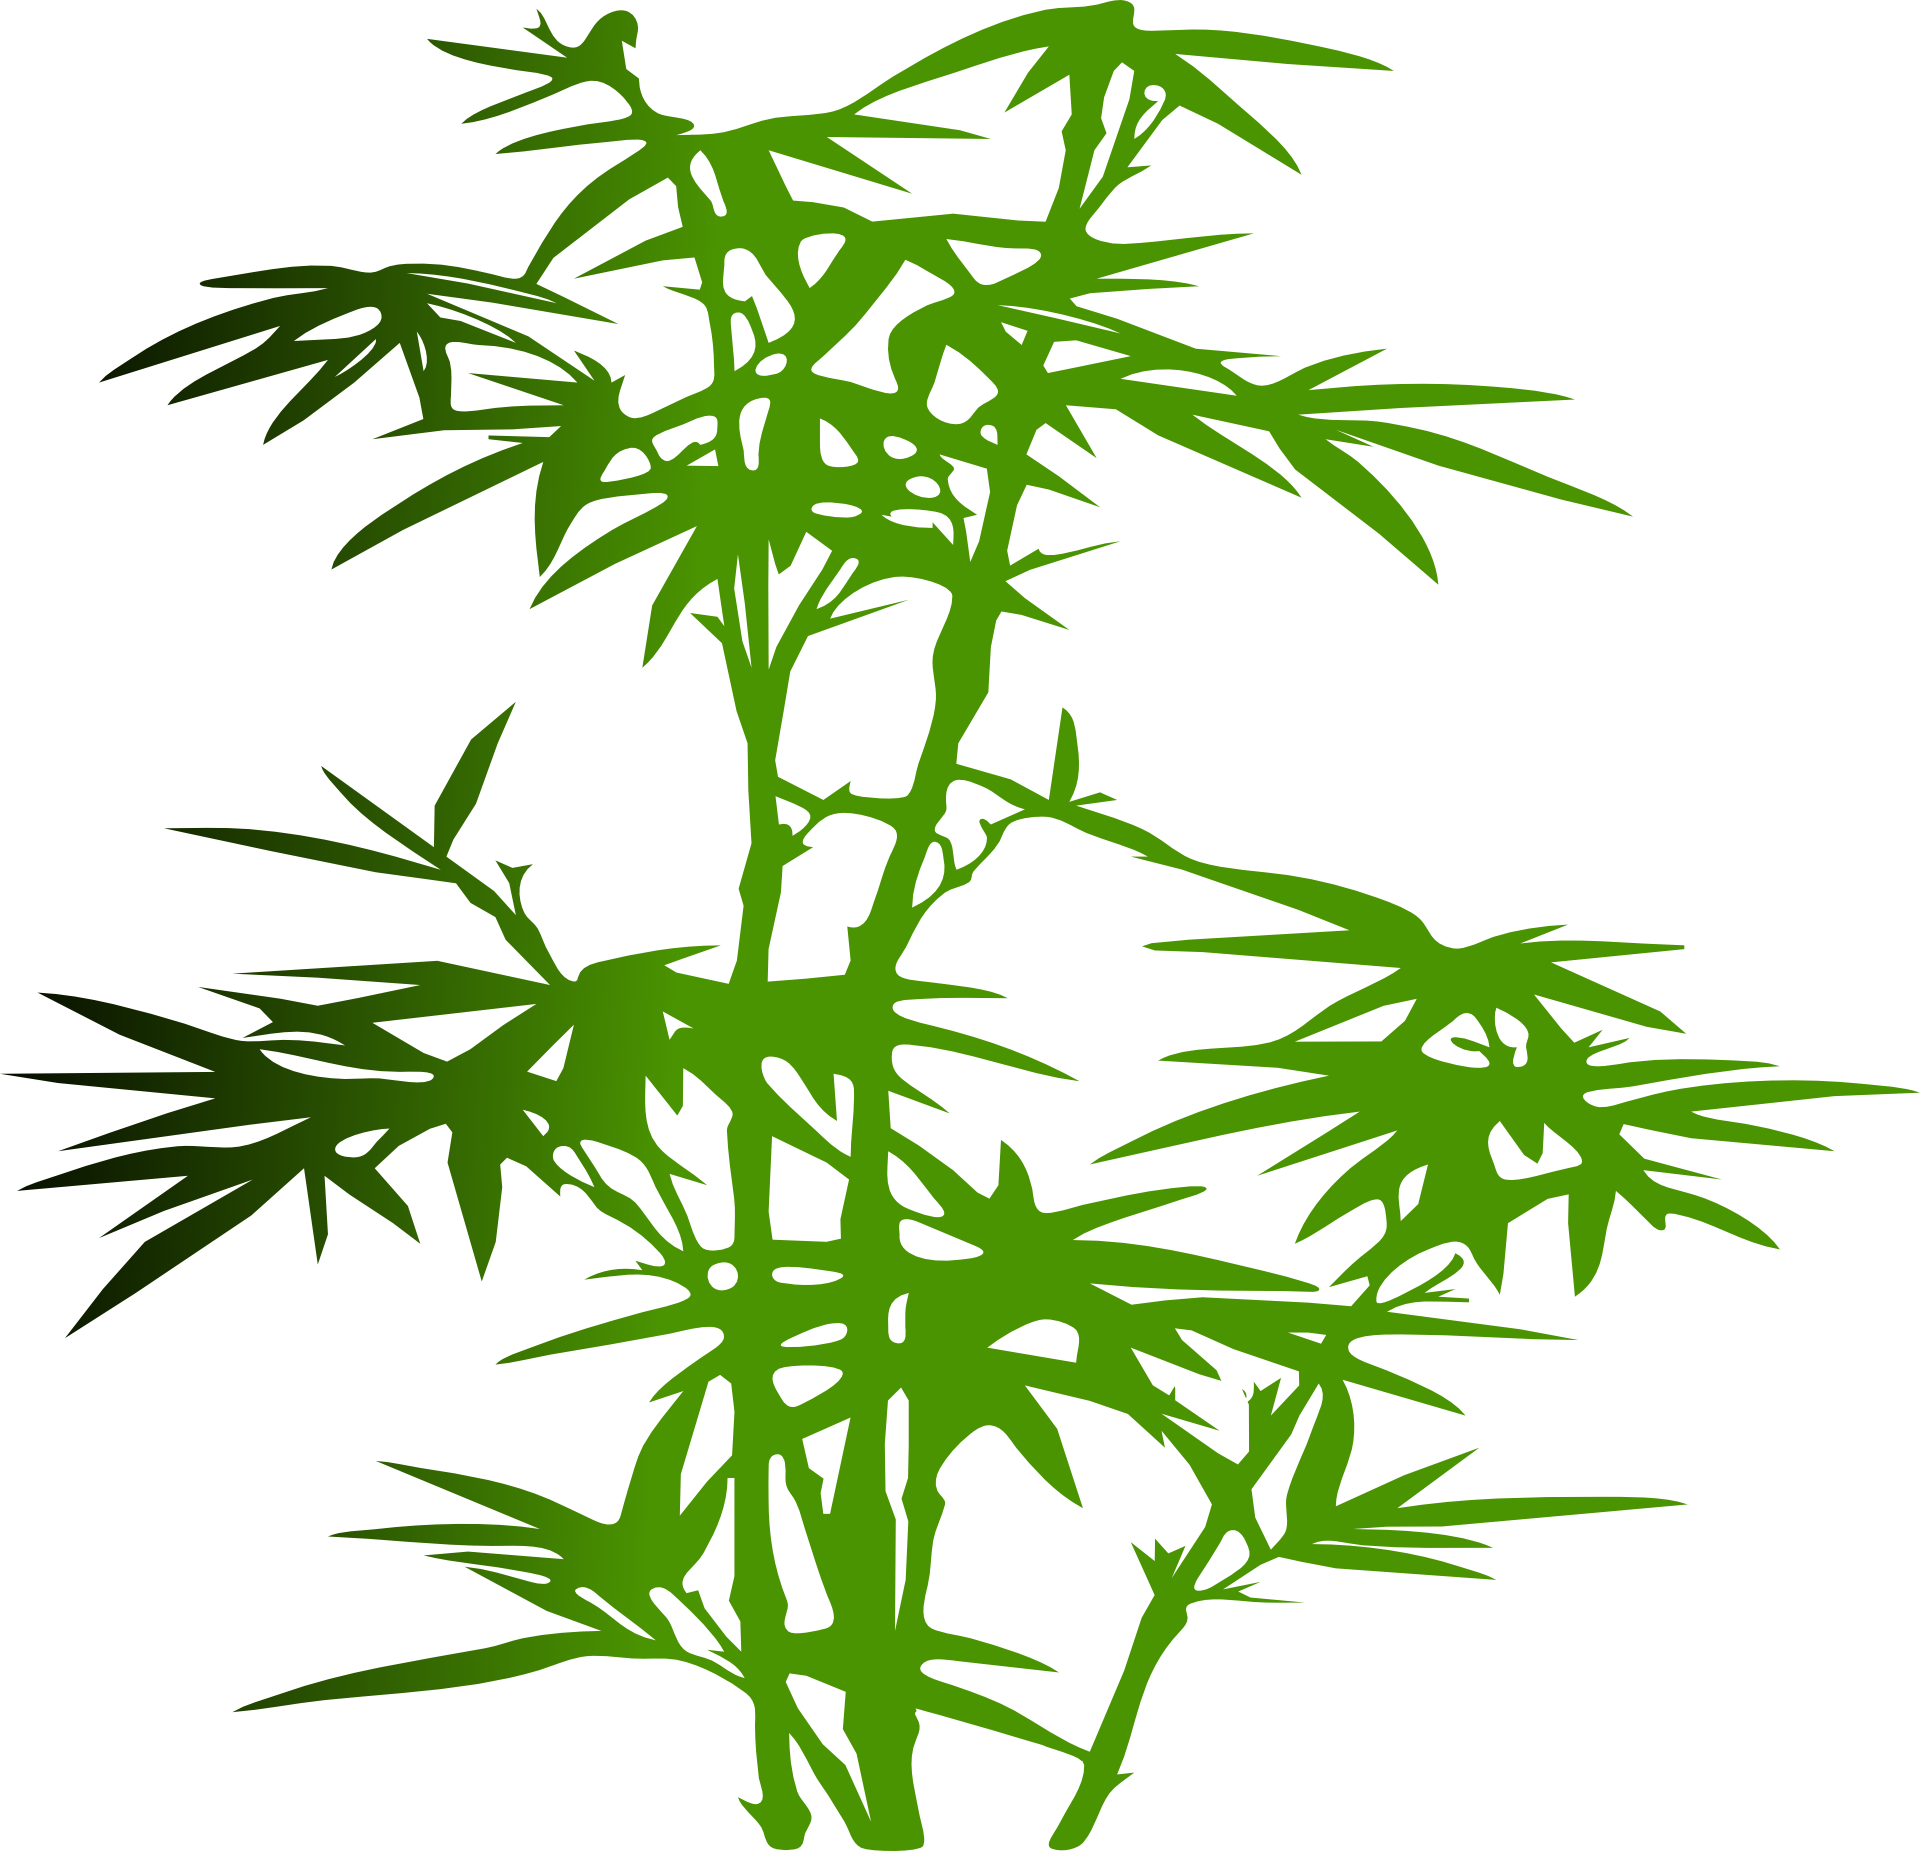 Bamboo Silhouette Clip art.